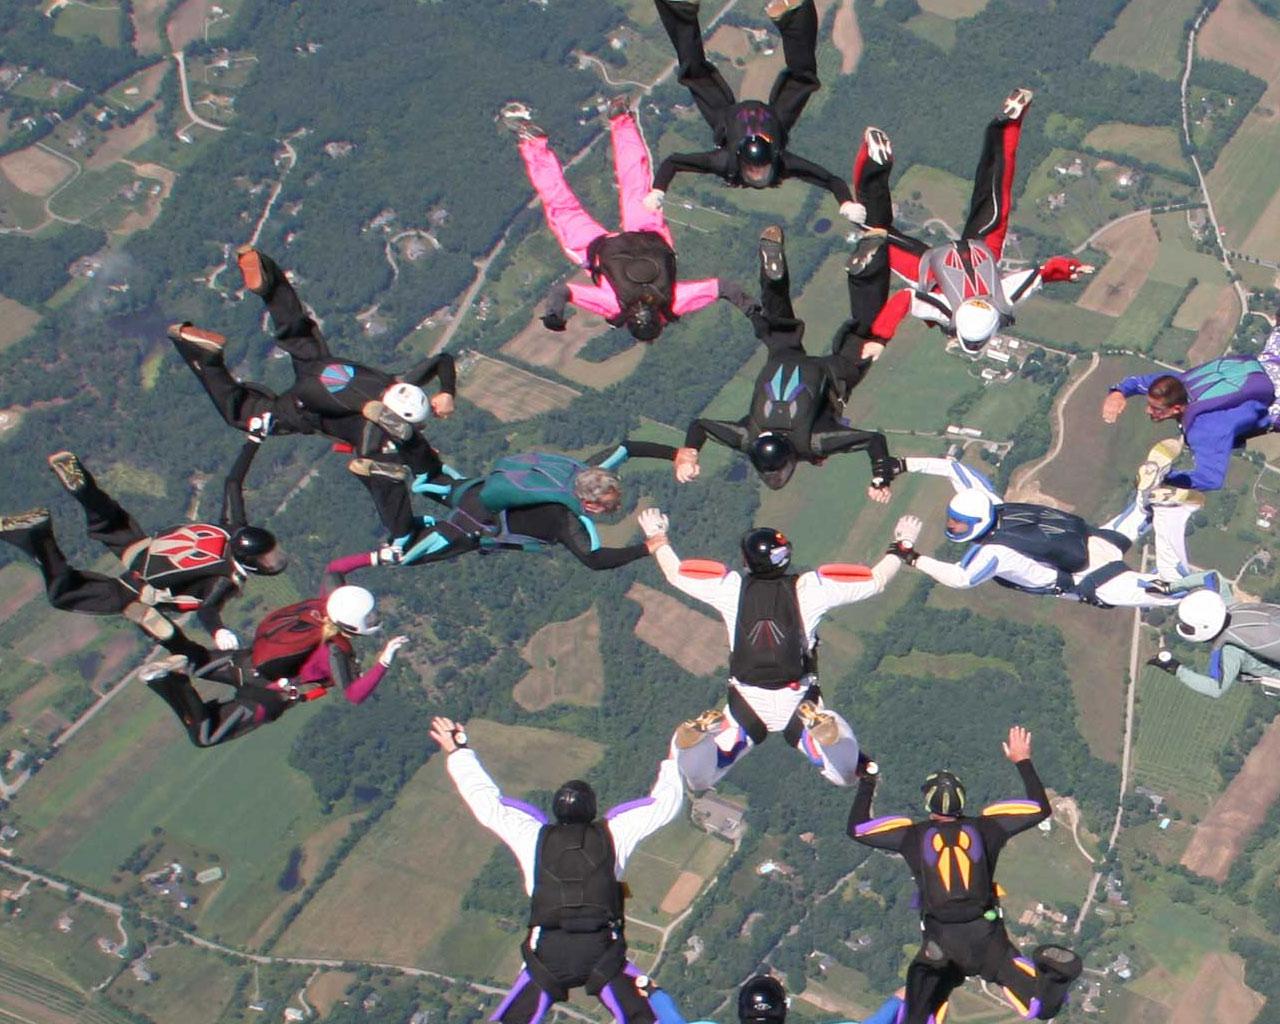 http://1.bp.blogspot.com/-dZZTob7V4uw/Te-rPk55RPI/AAAAAAAAAXU/-rZkgPGtYyk/s1600/skydiving%2Bwallpaper.jpg